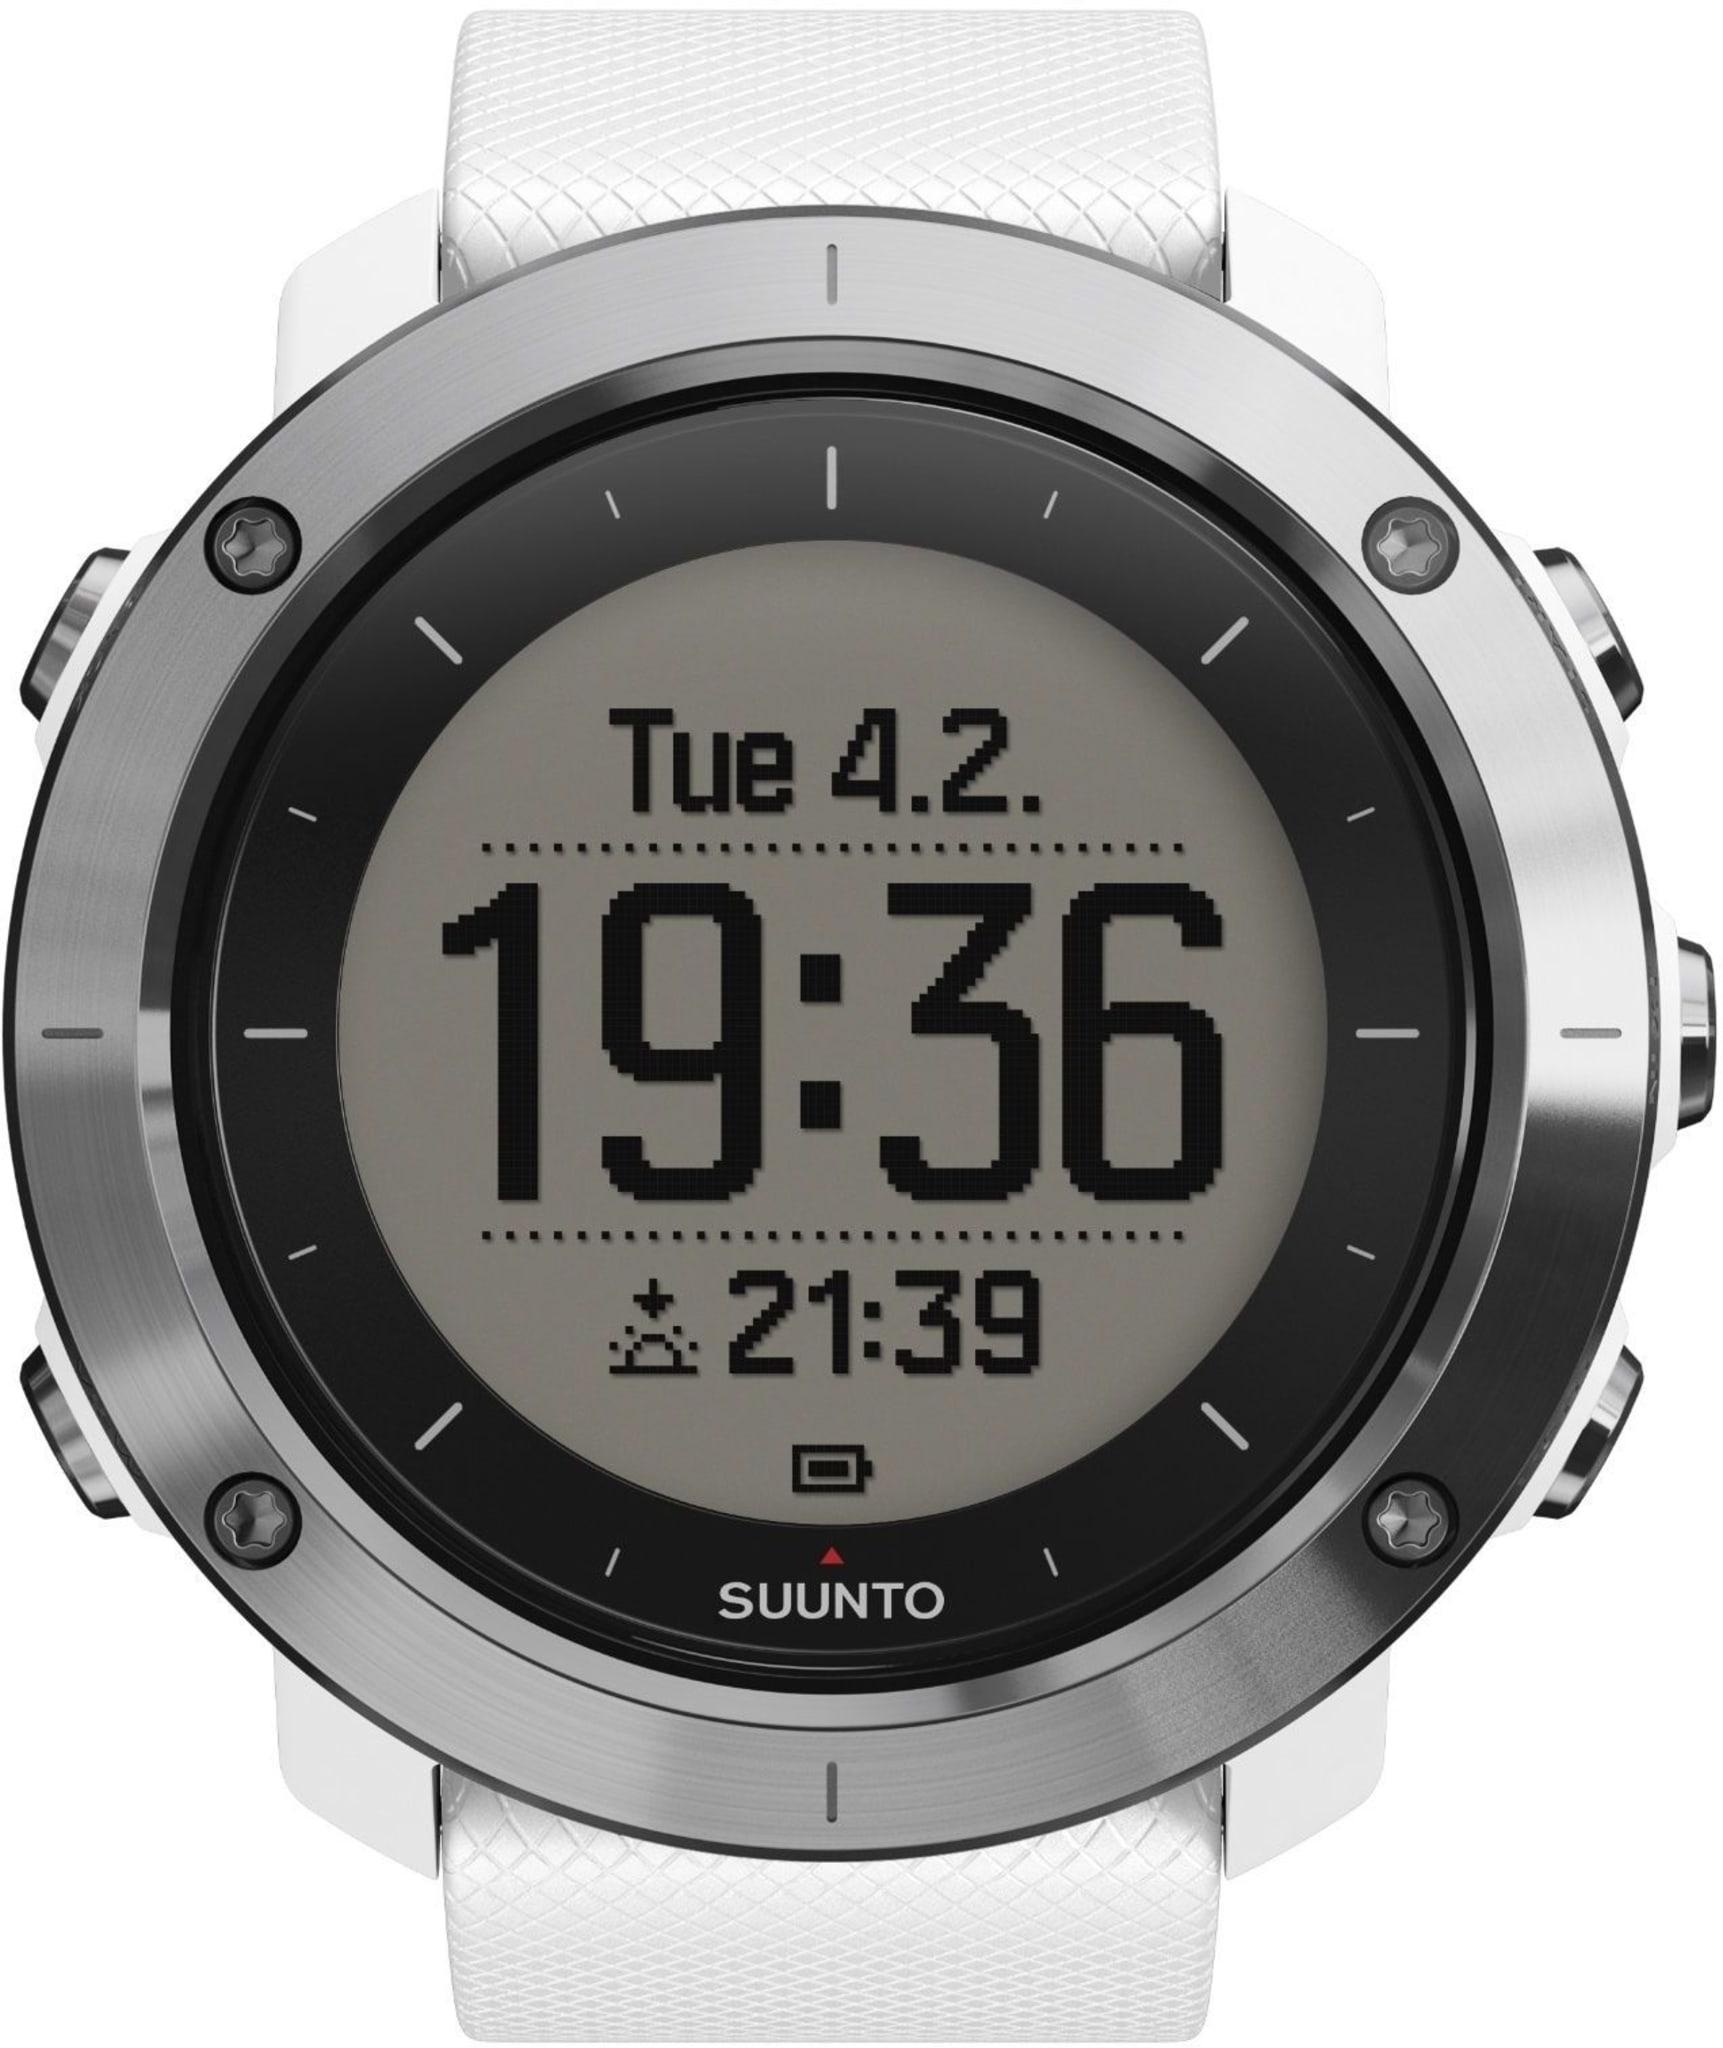 Friluftsklokke med Alti/Baro/kompass,integrert GPS og Bluetooth.